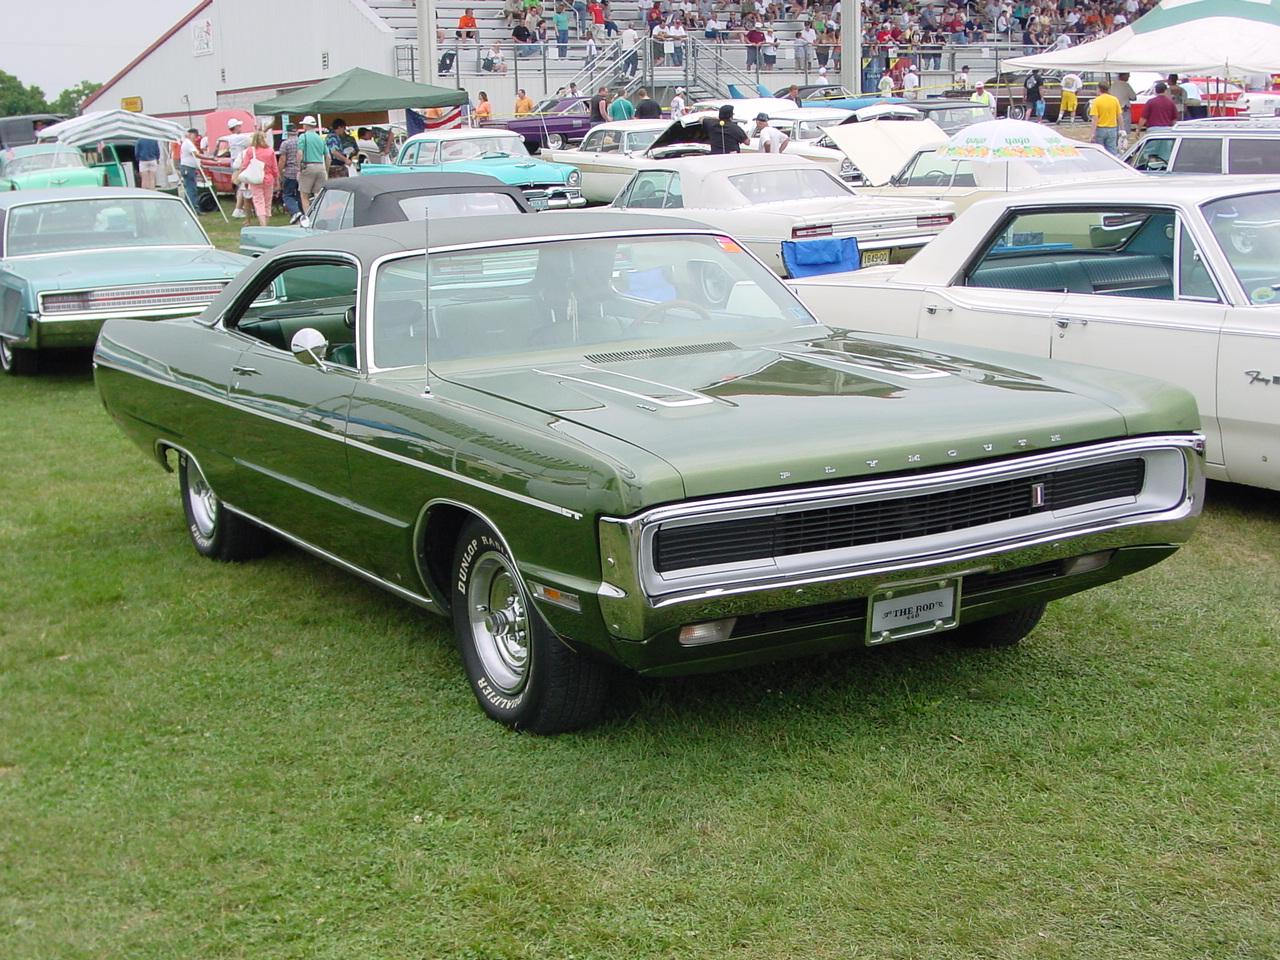 The Mopar Motorhead: 1970 Plymouth Fury